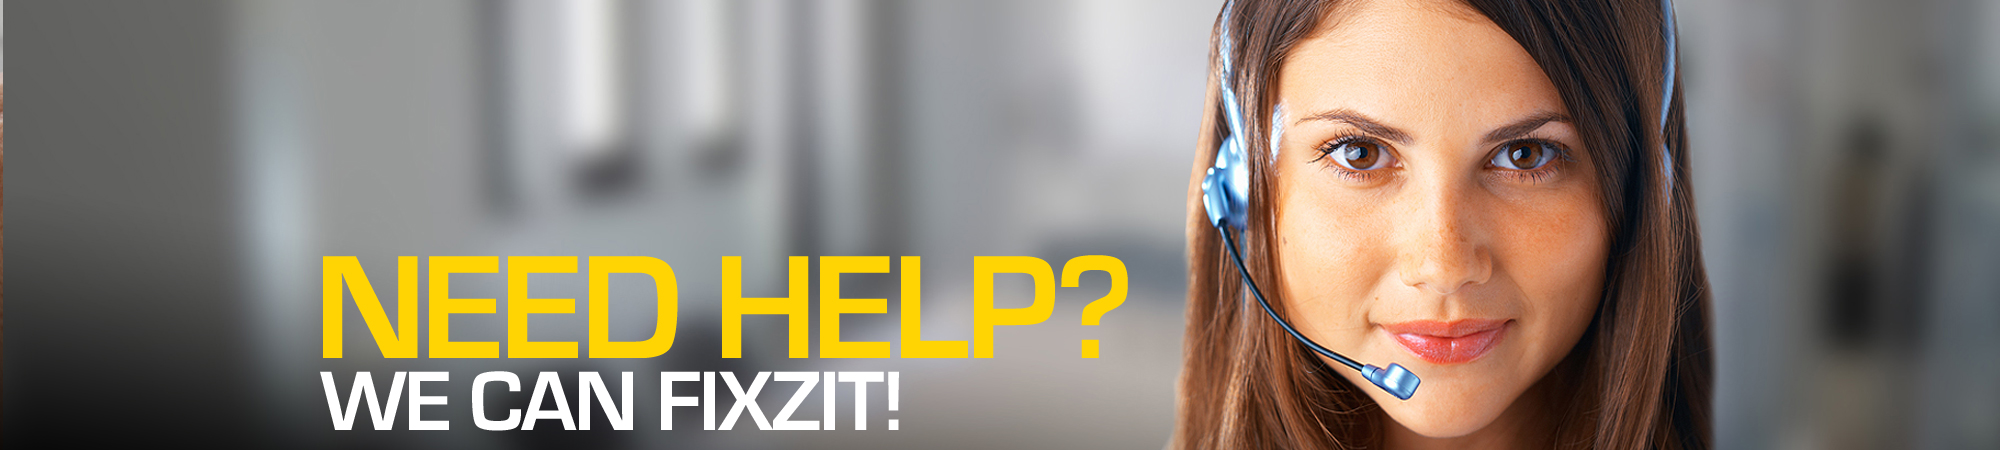 Fixzit-Slider-Need-Help-1